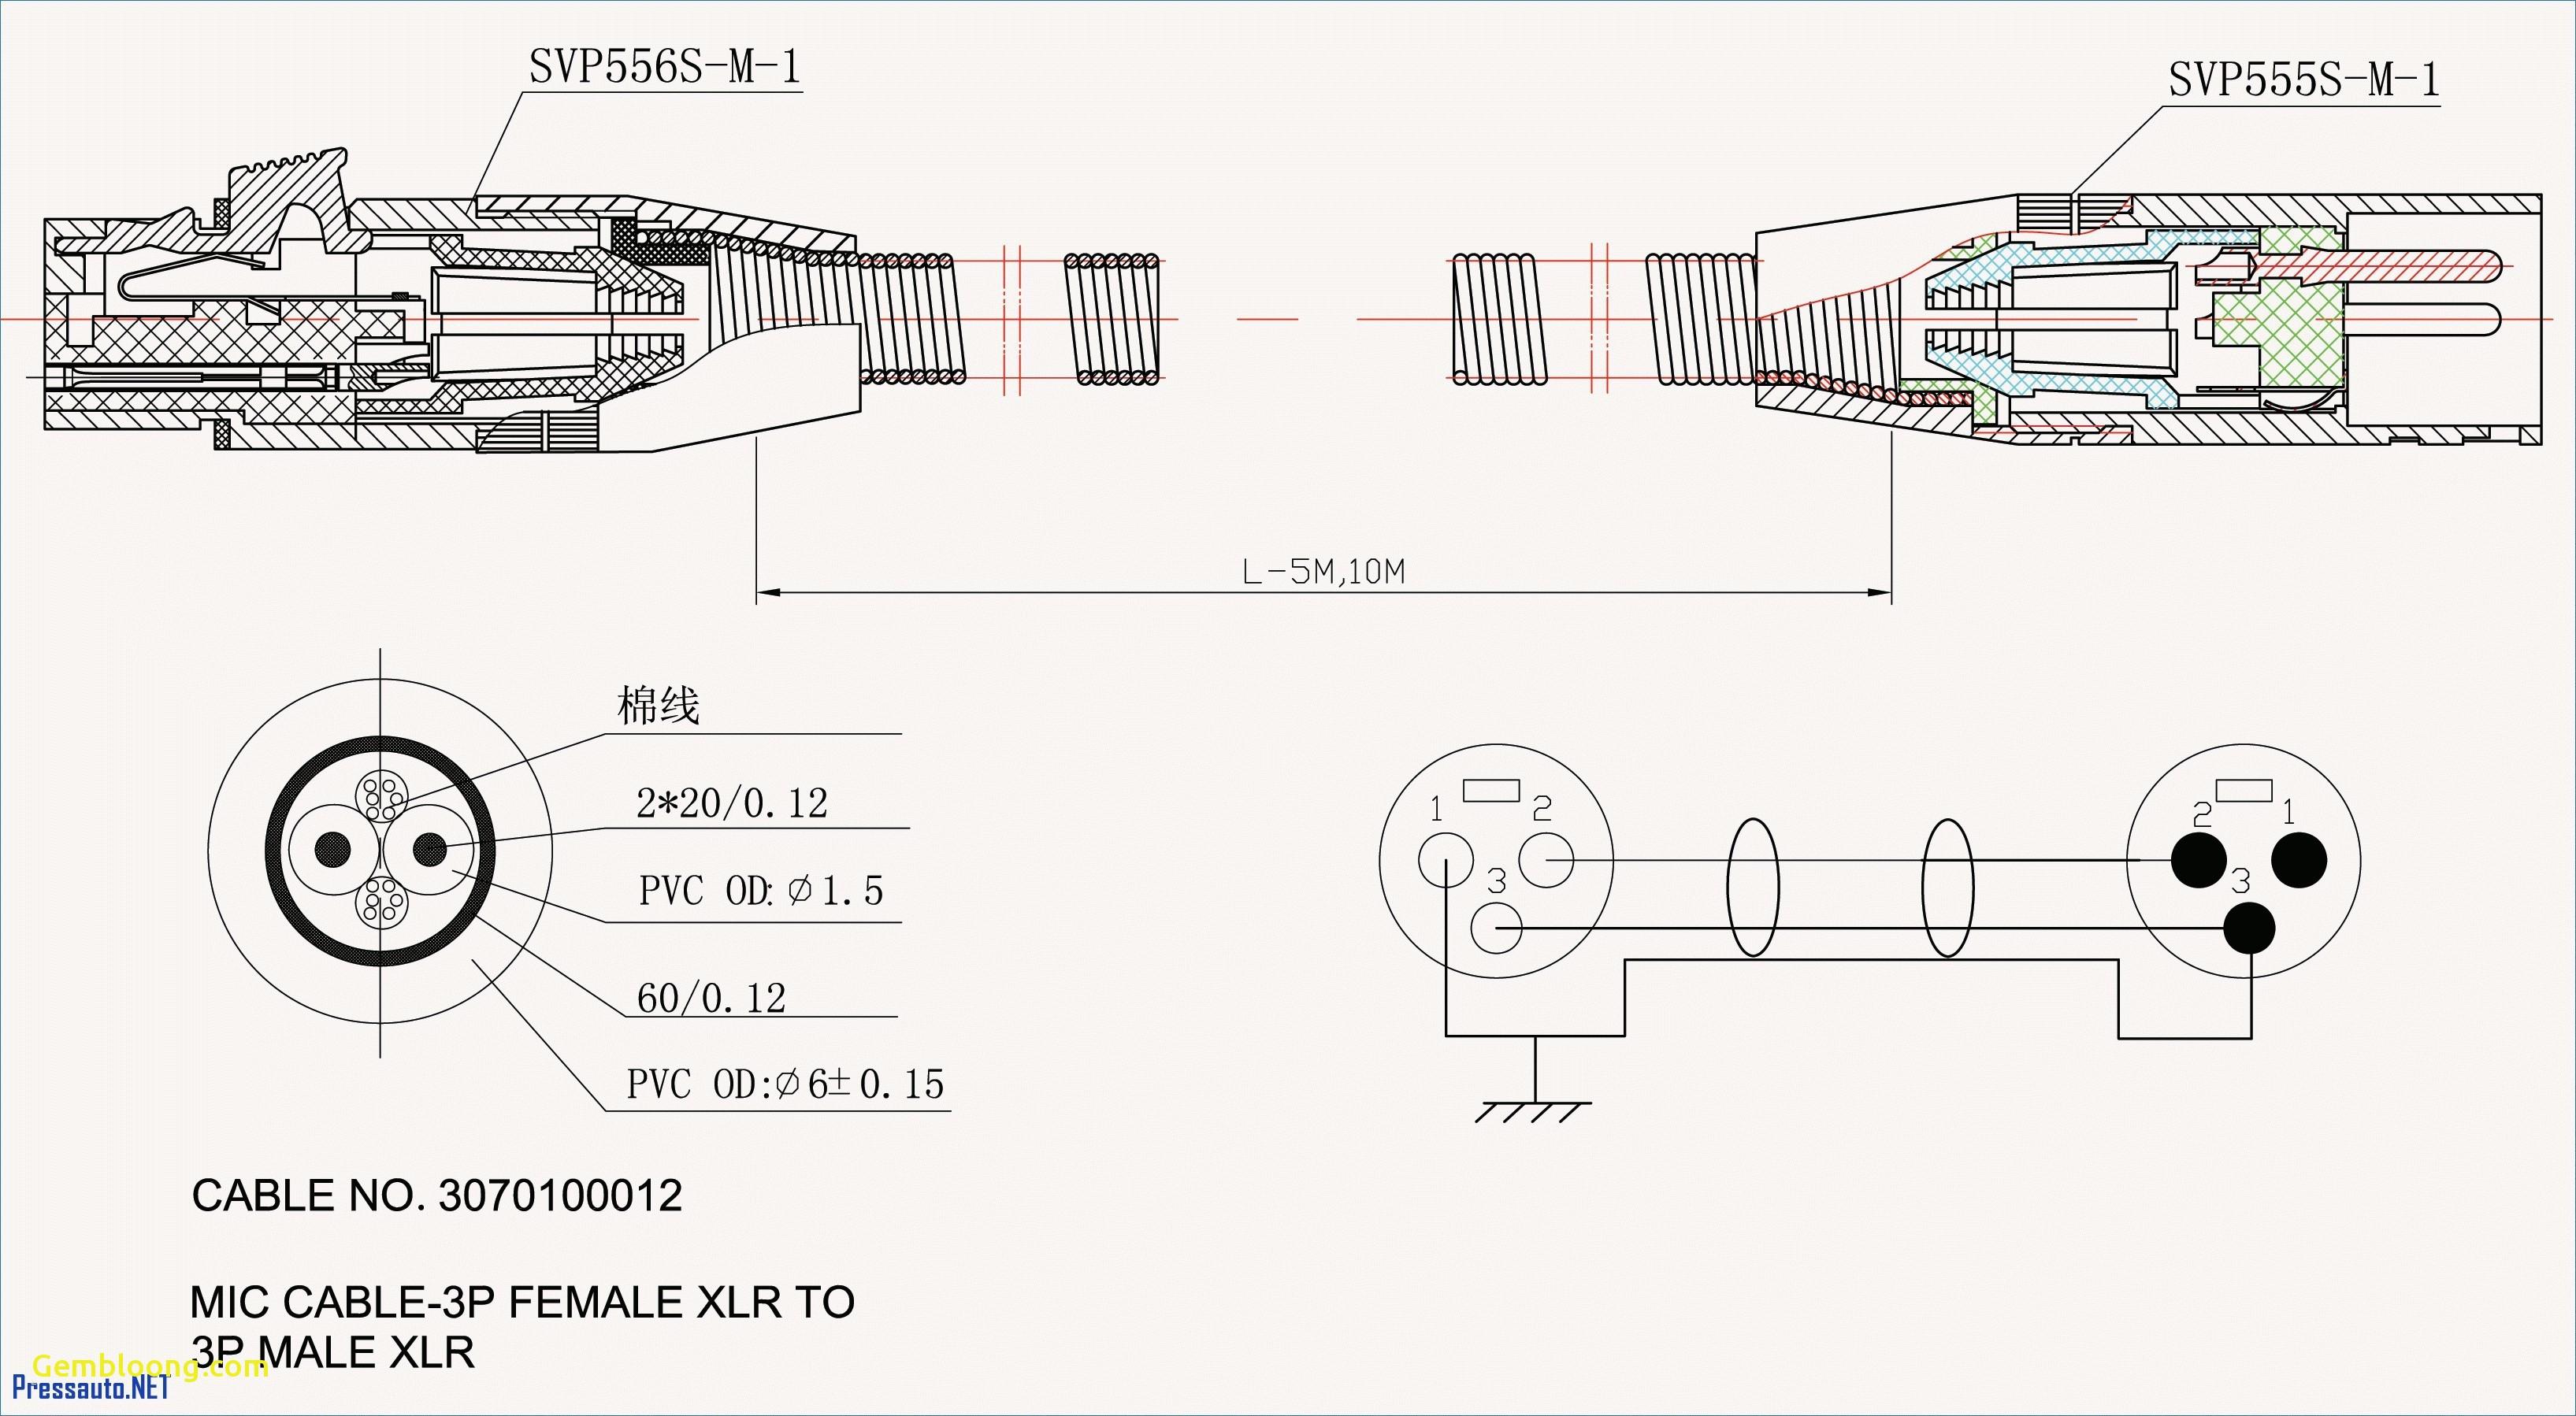 2001 ford Escape Engine Diagram ford Aerostar Engine Diagram 2000 ford Ranger 3 0 Heater Hose Of 2001 ford Escape Engine Diagram